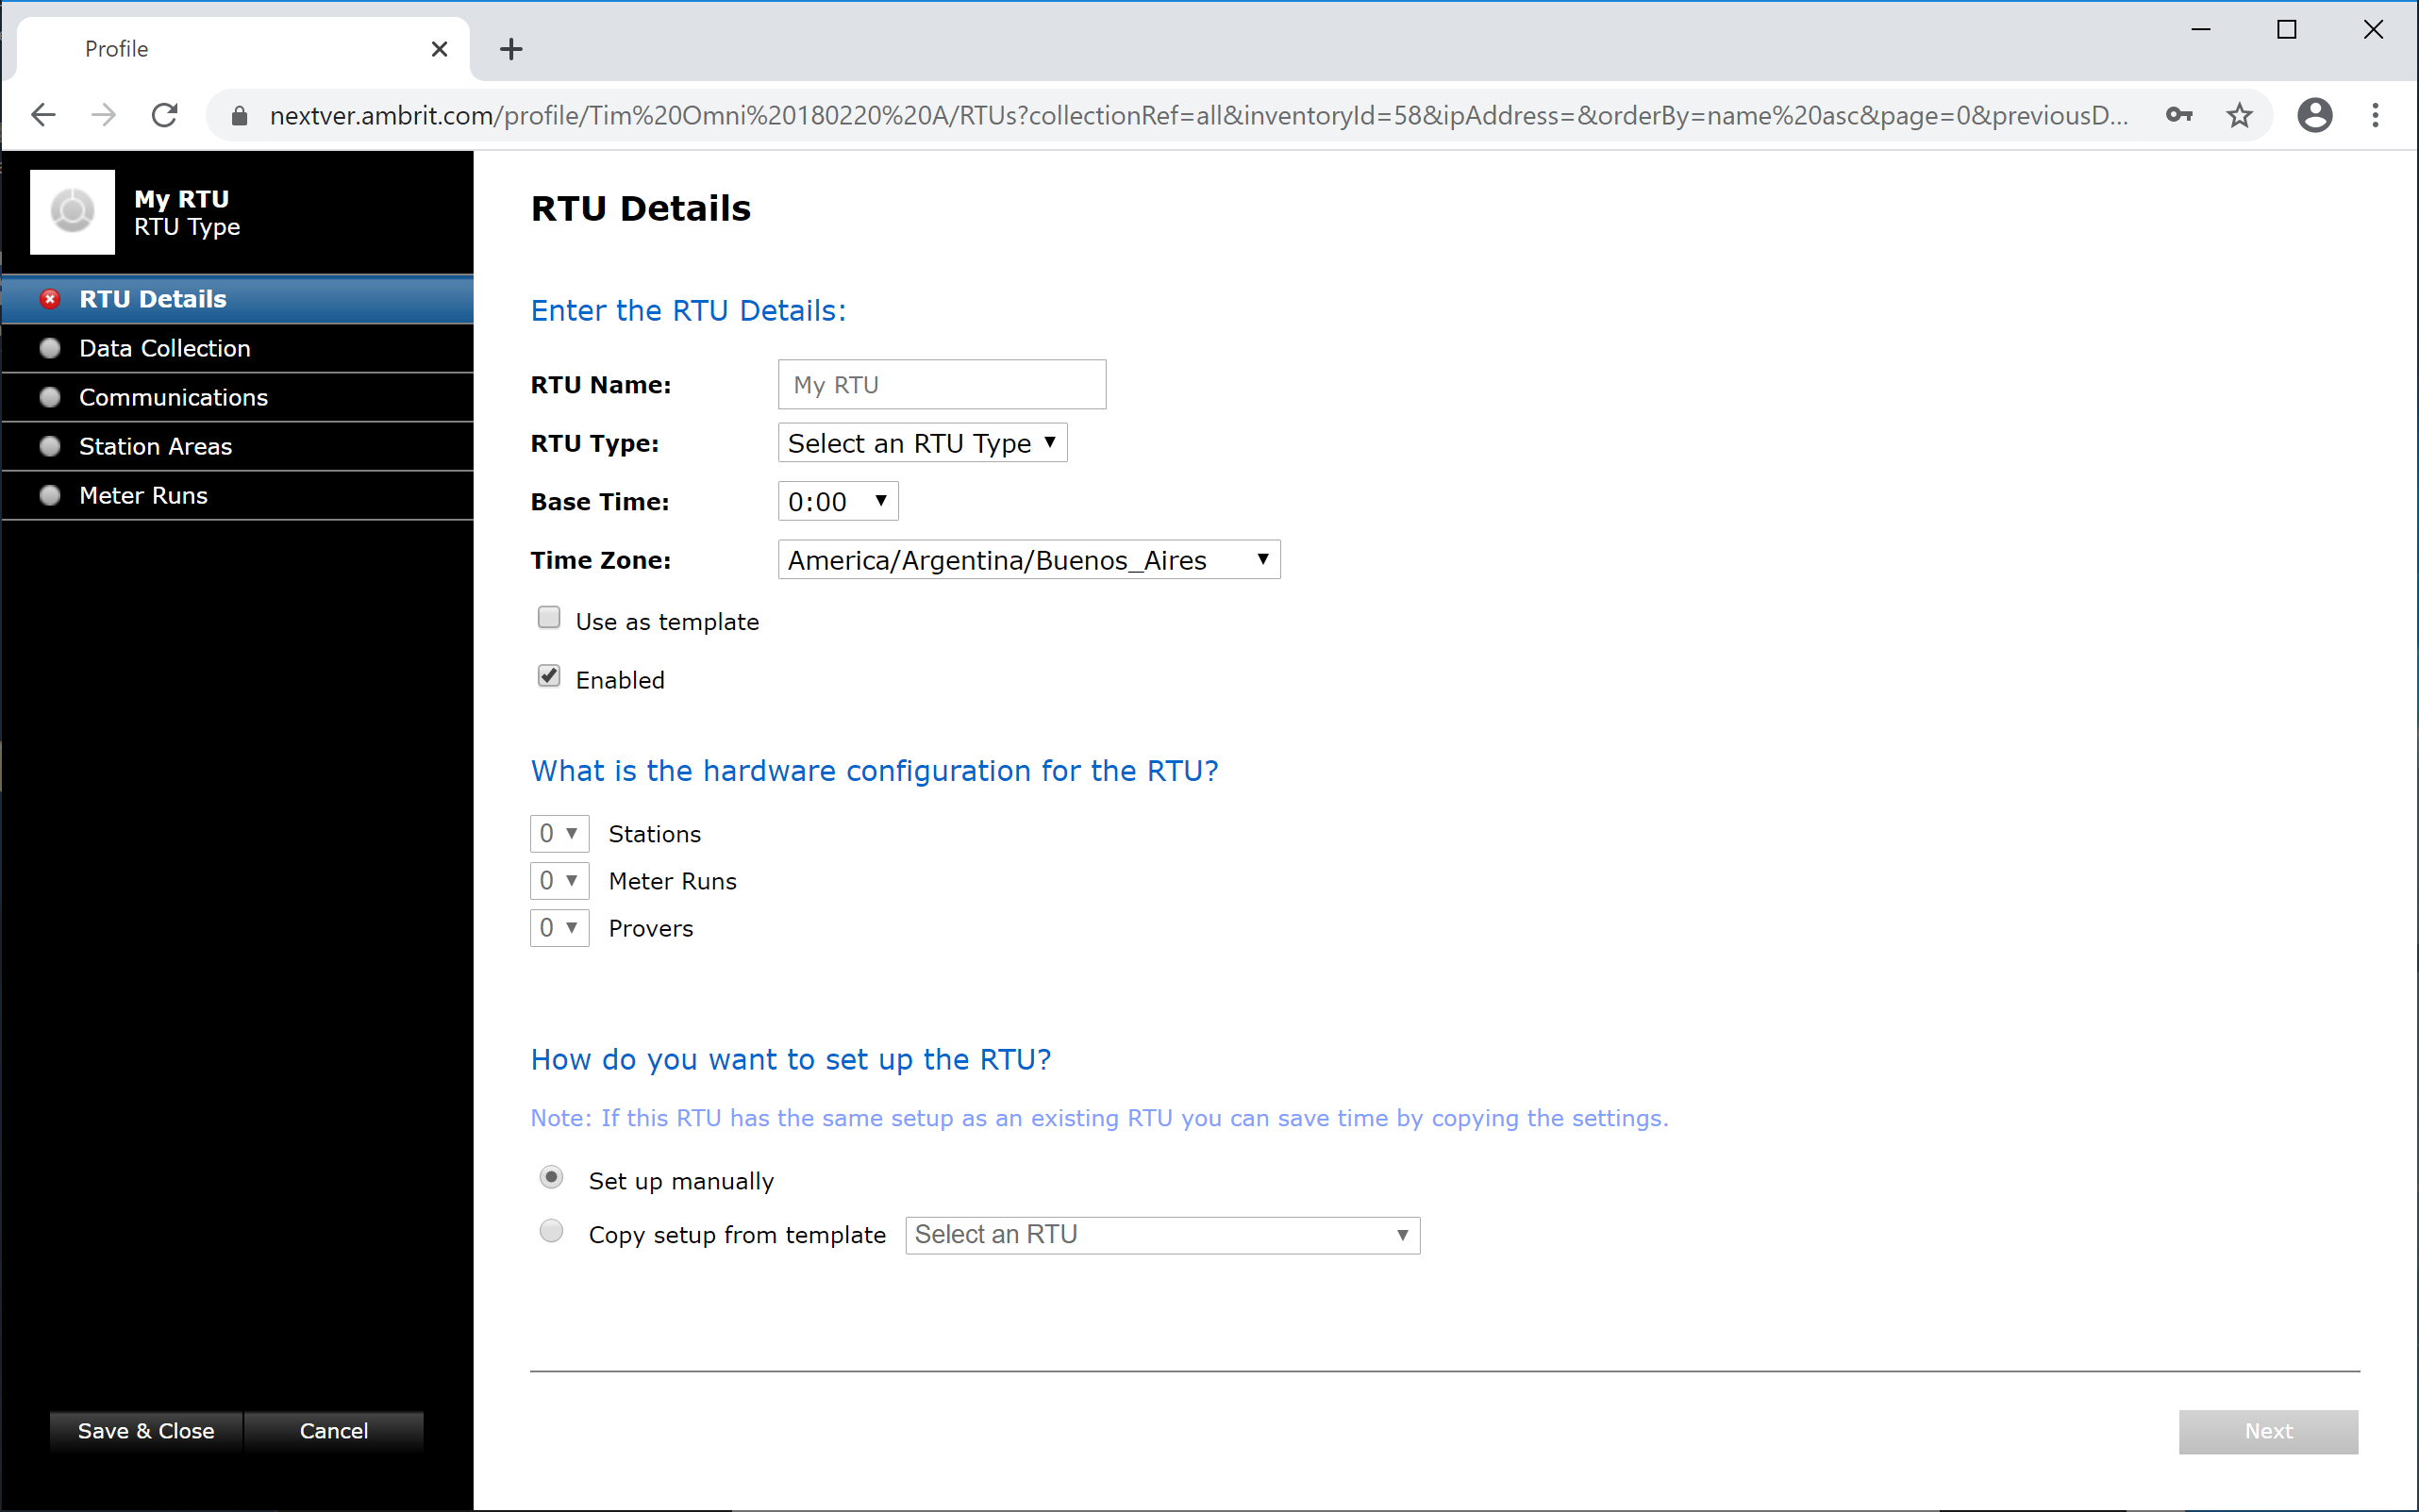 RTU Details Blank